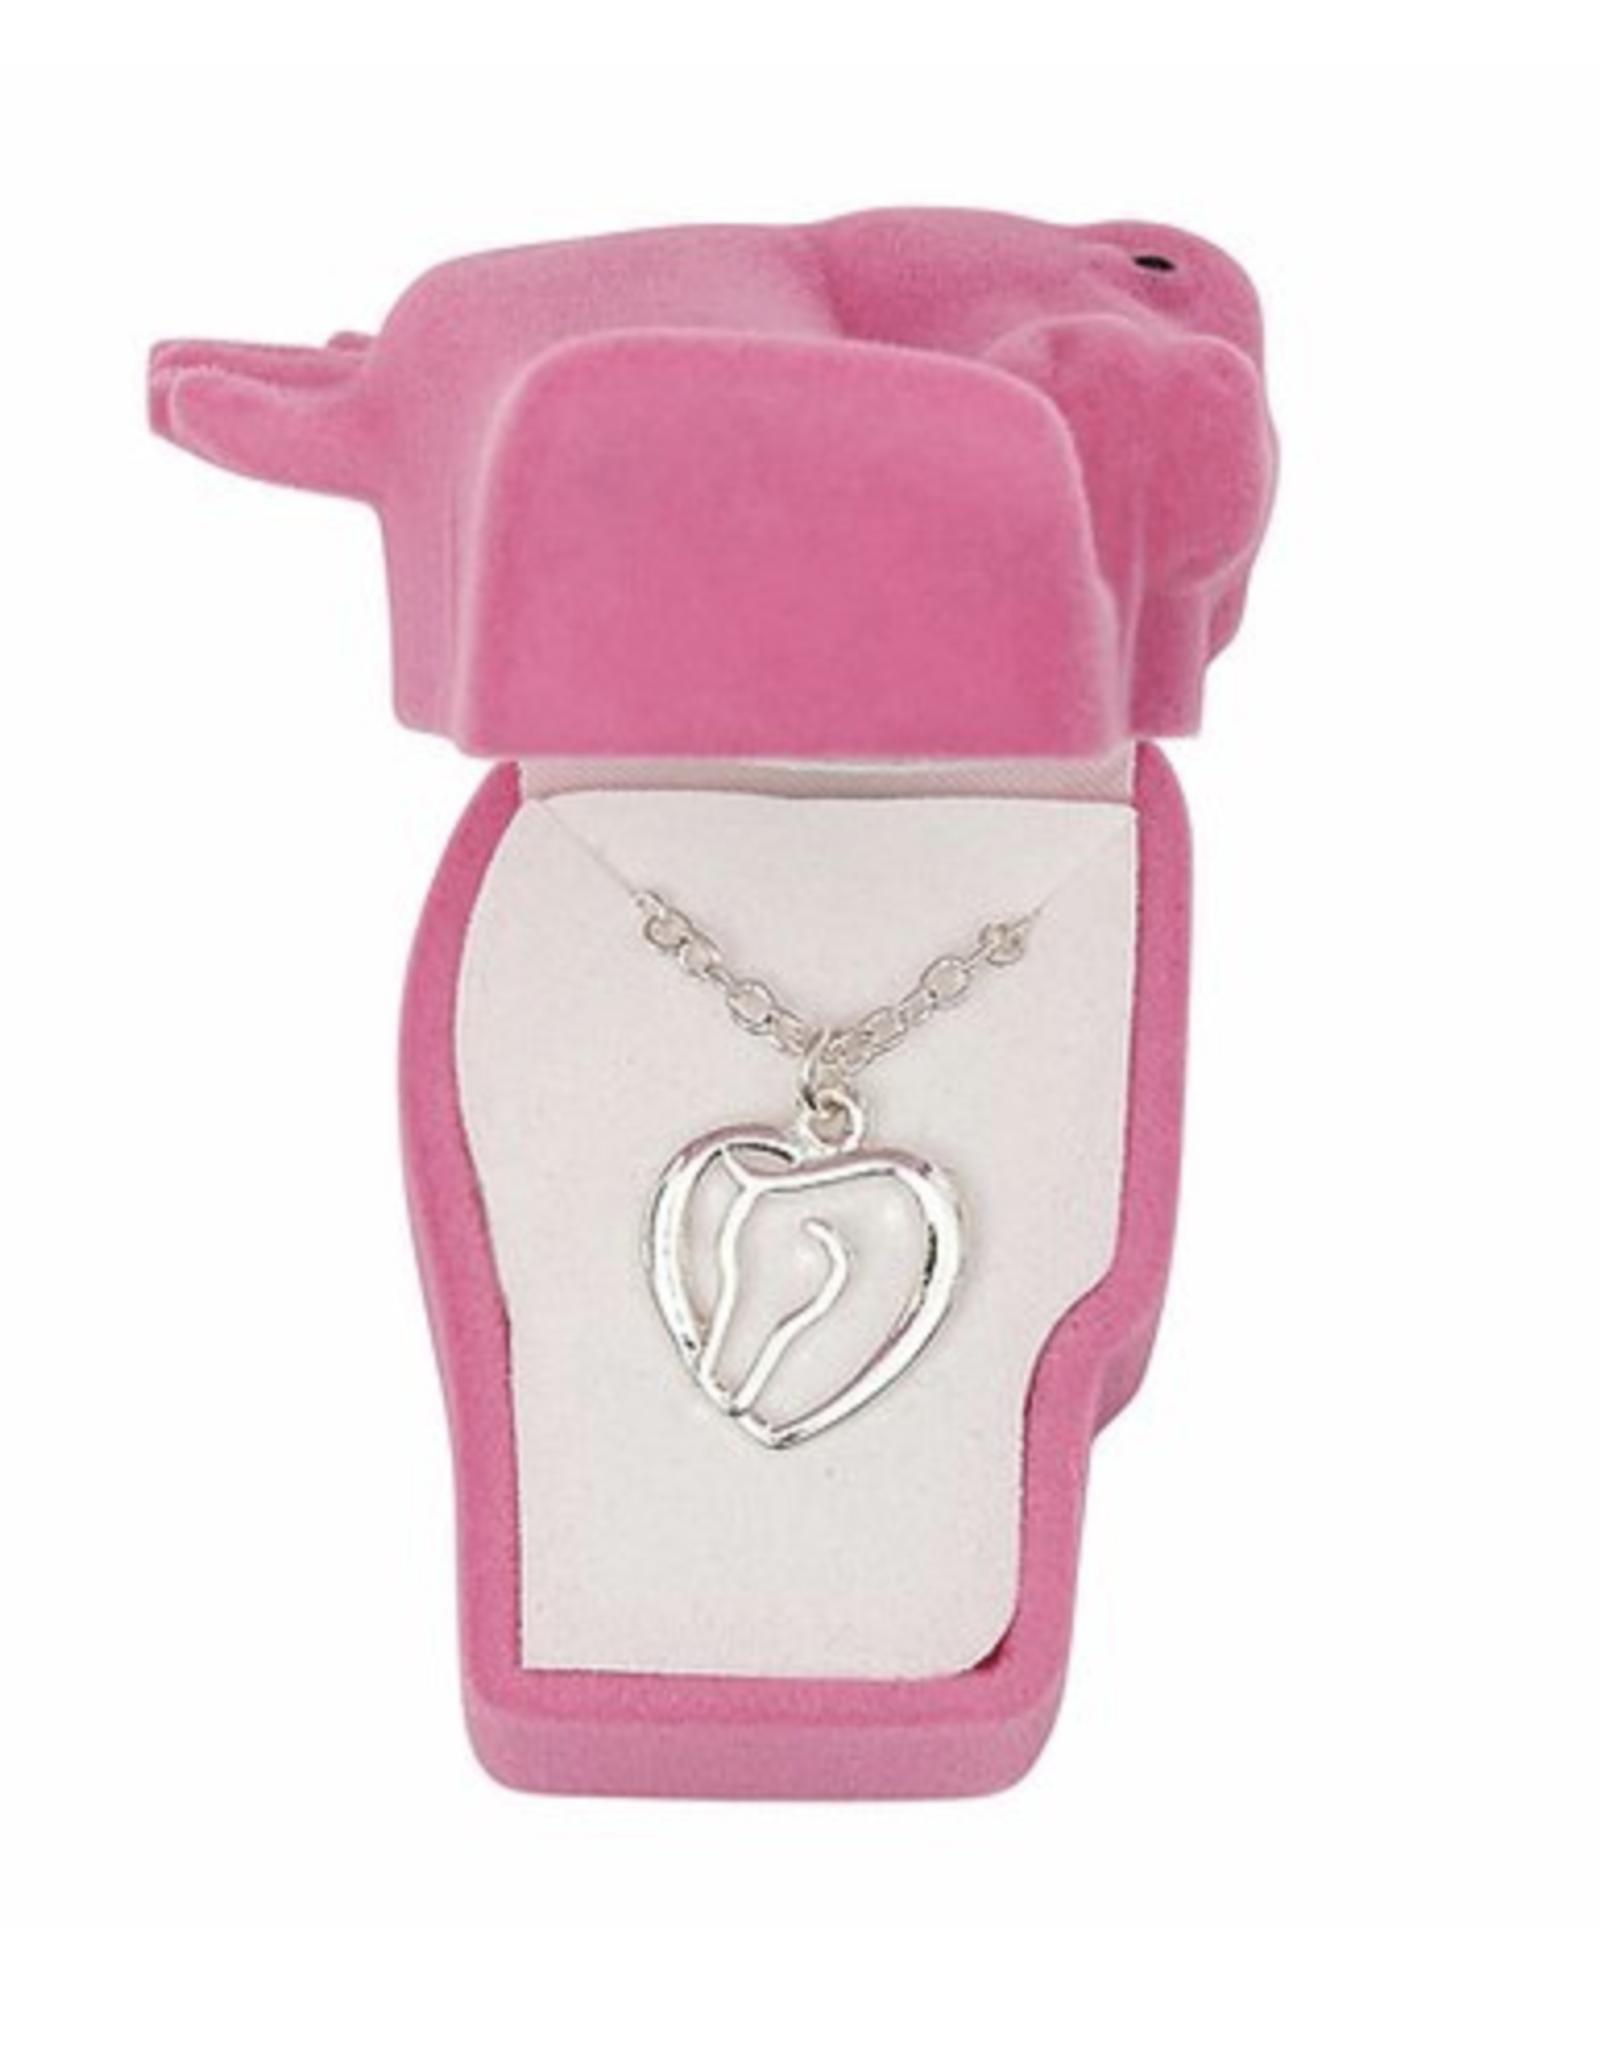 AWST Awst Horse Head & Heart Necklace